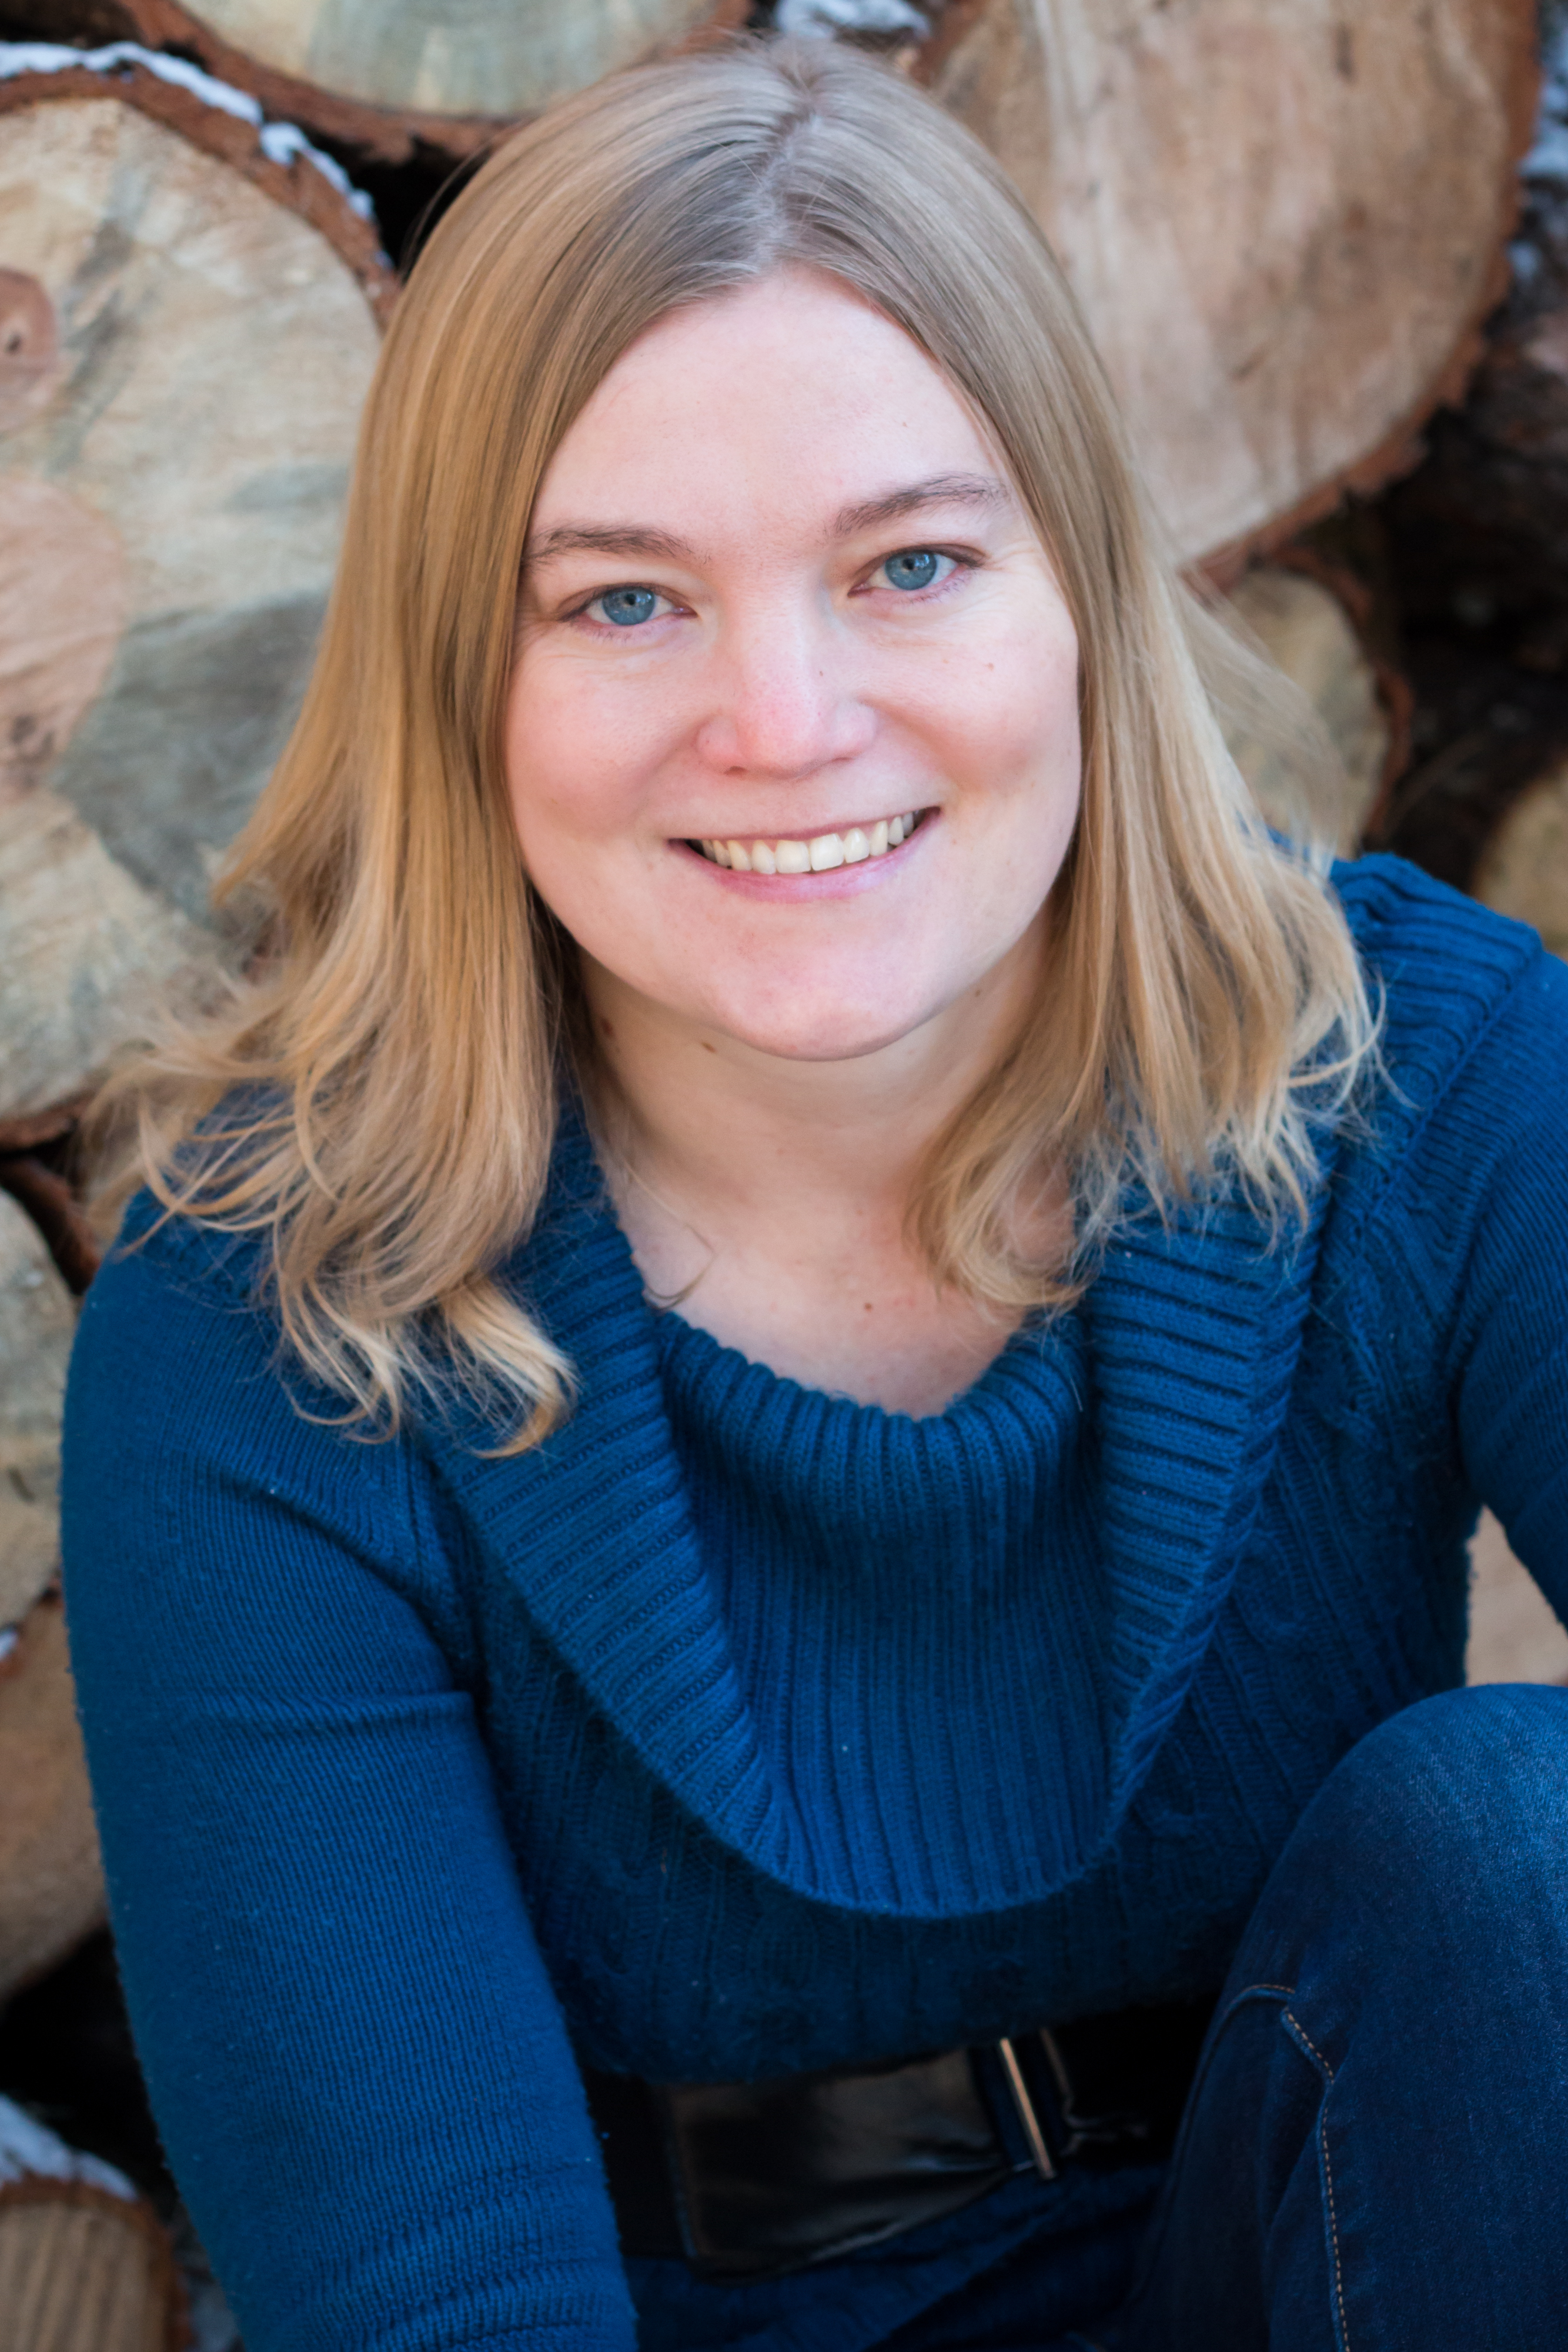 2019 Arizona Author Series - Melissa Sevigny